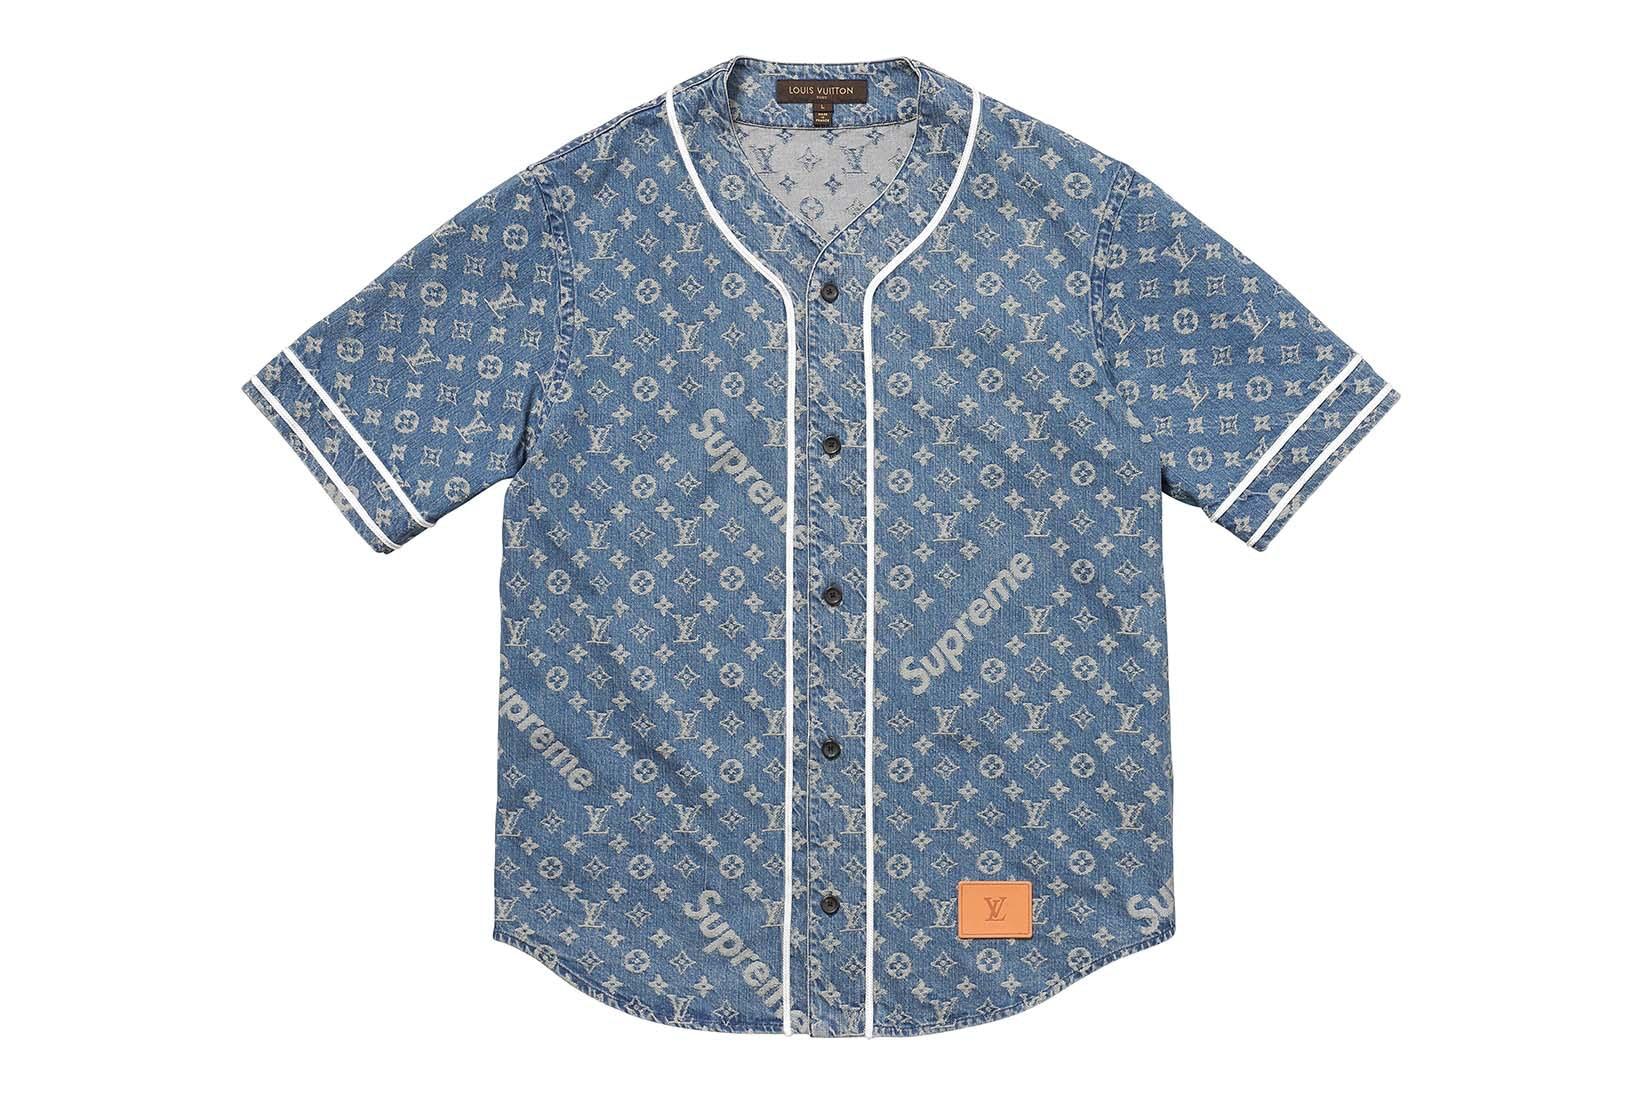 Supreme(シュプリーム)×Louis Vuitton(ルイ・ヴィトン) / ジャカード デニム ベースボール ジャージー(Jacquard Denim Baseball Jersey)